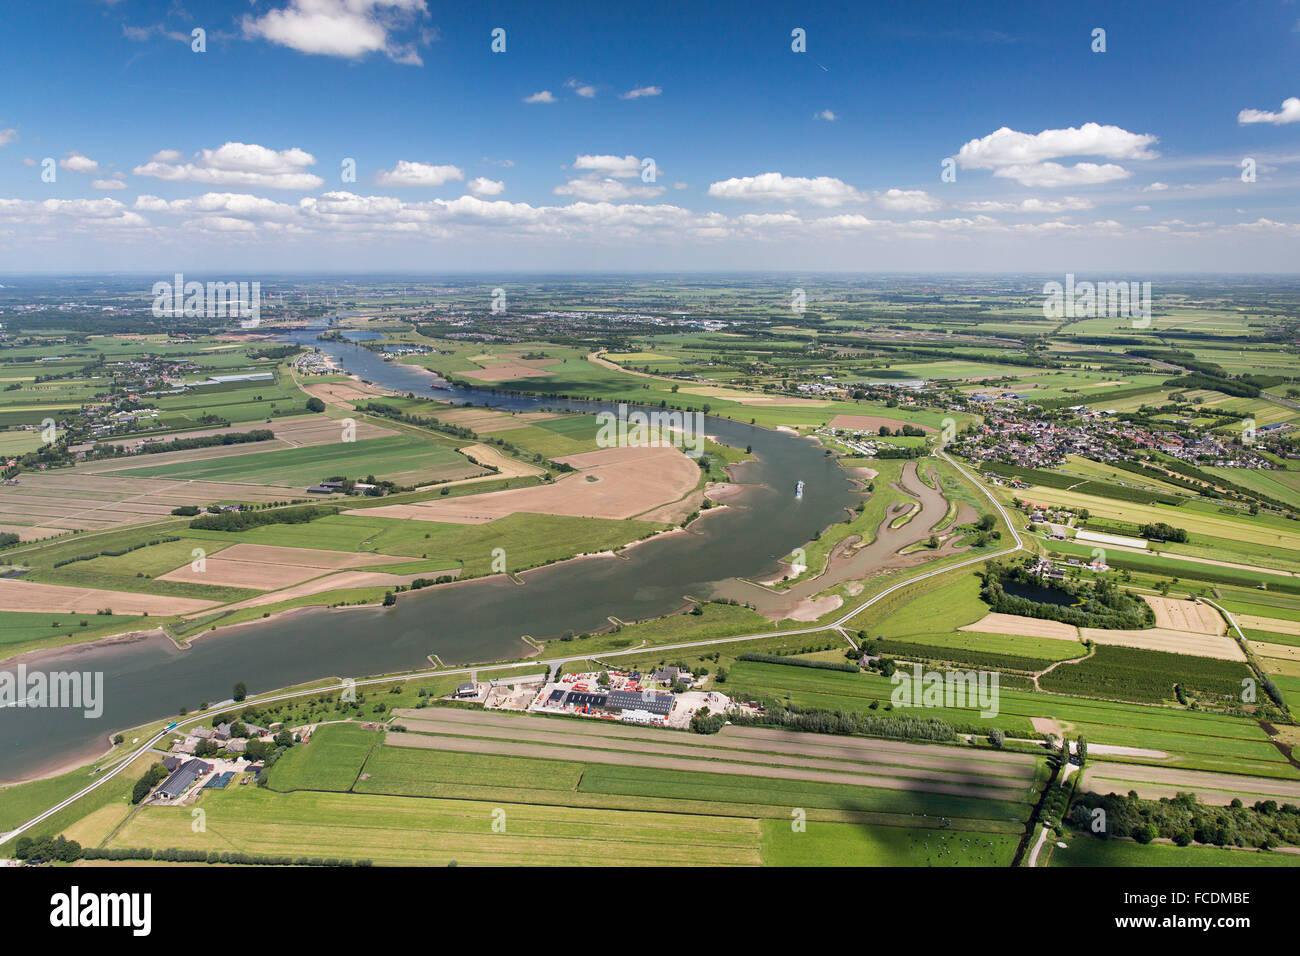 Netherlands, Lexmond, Cargo boat in river Lek. Farmland. Aerial - Stock Image